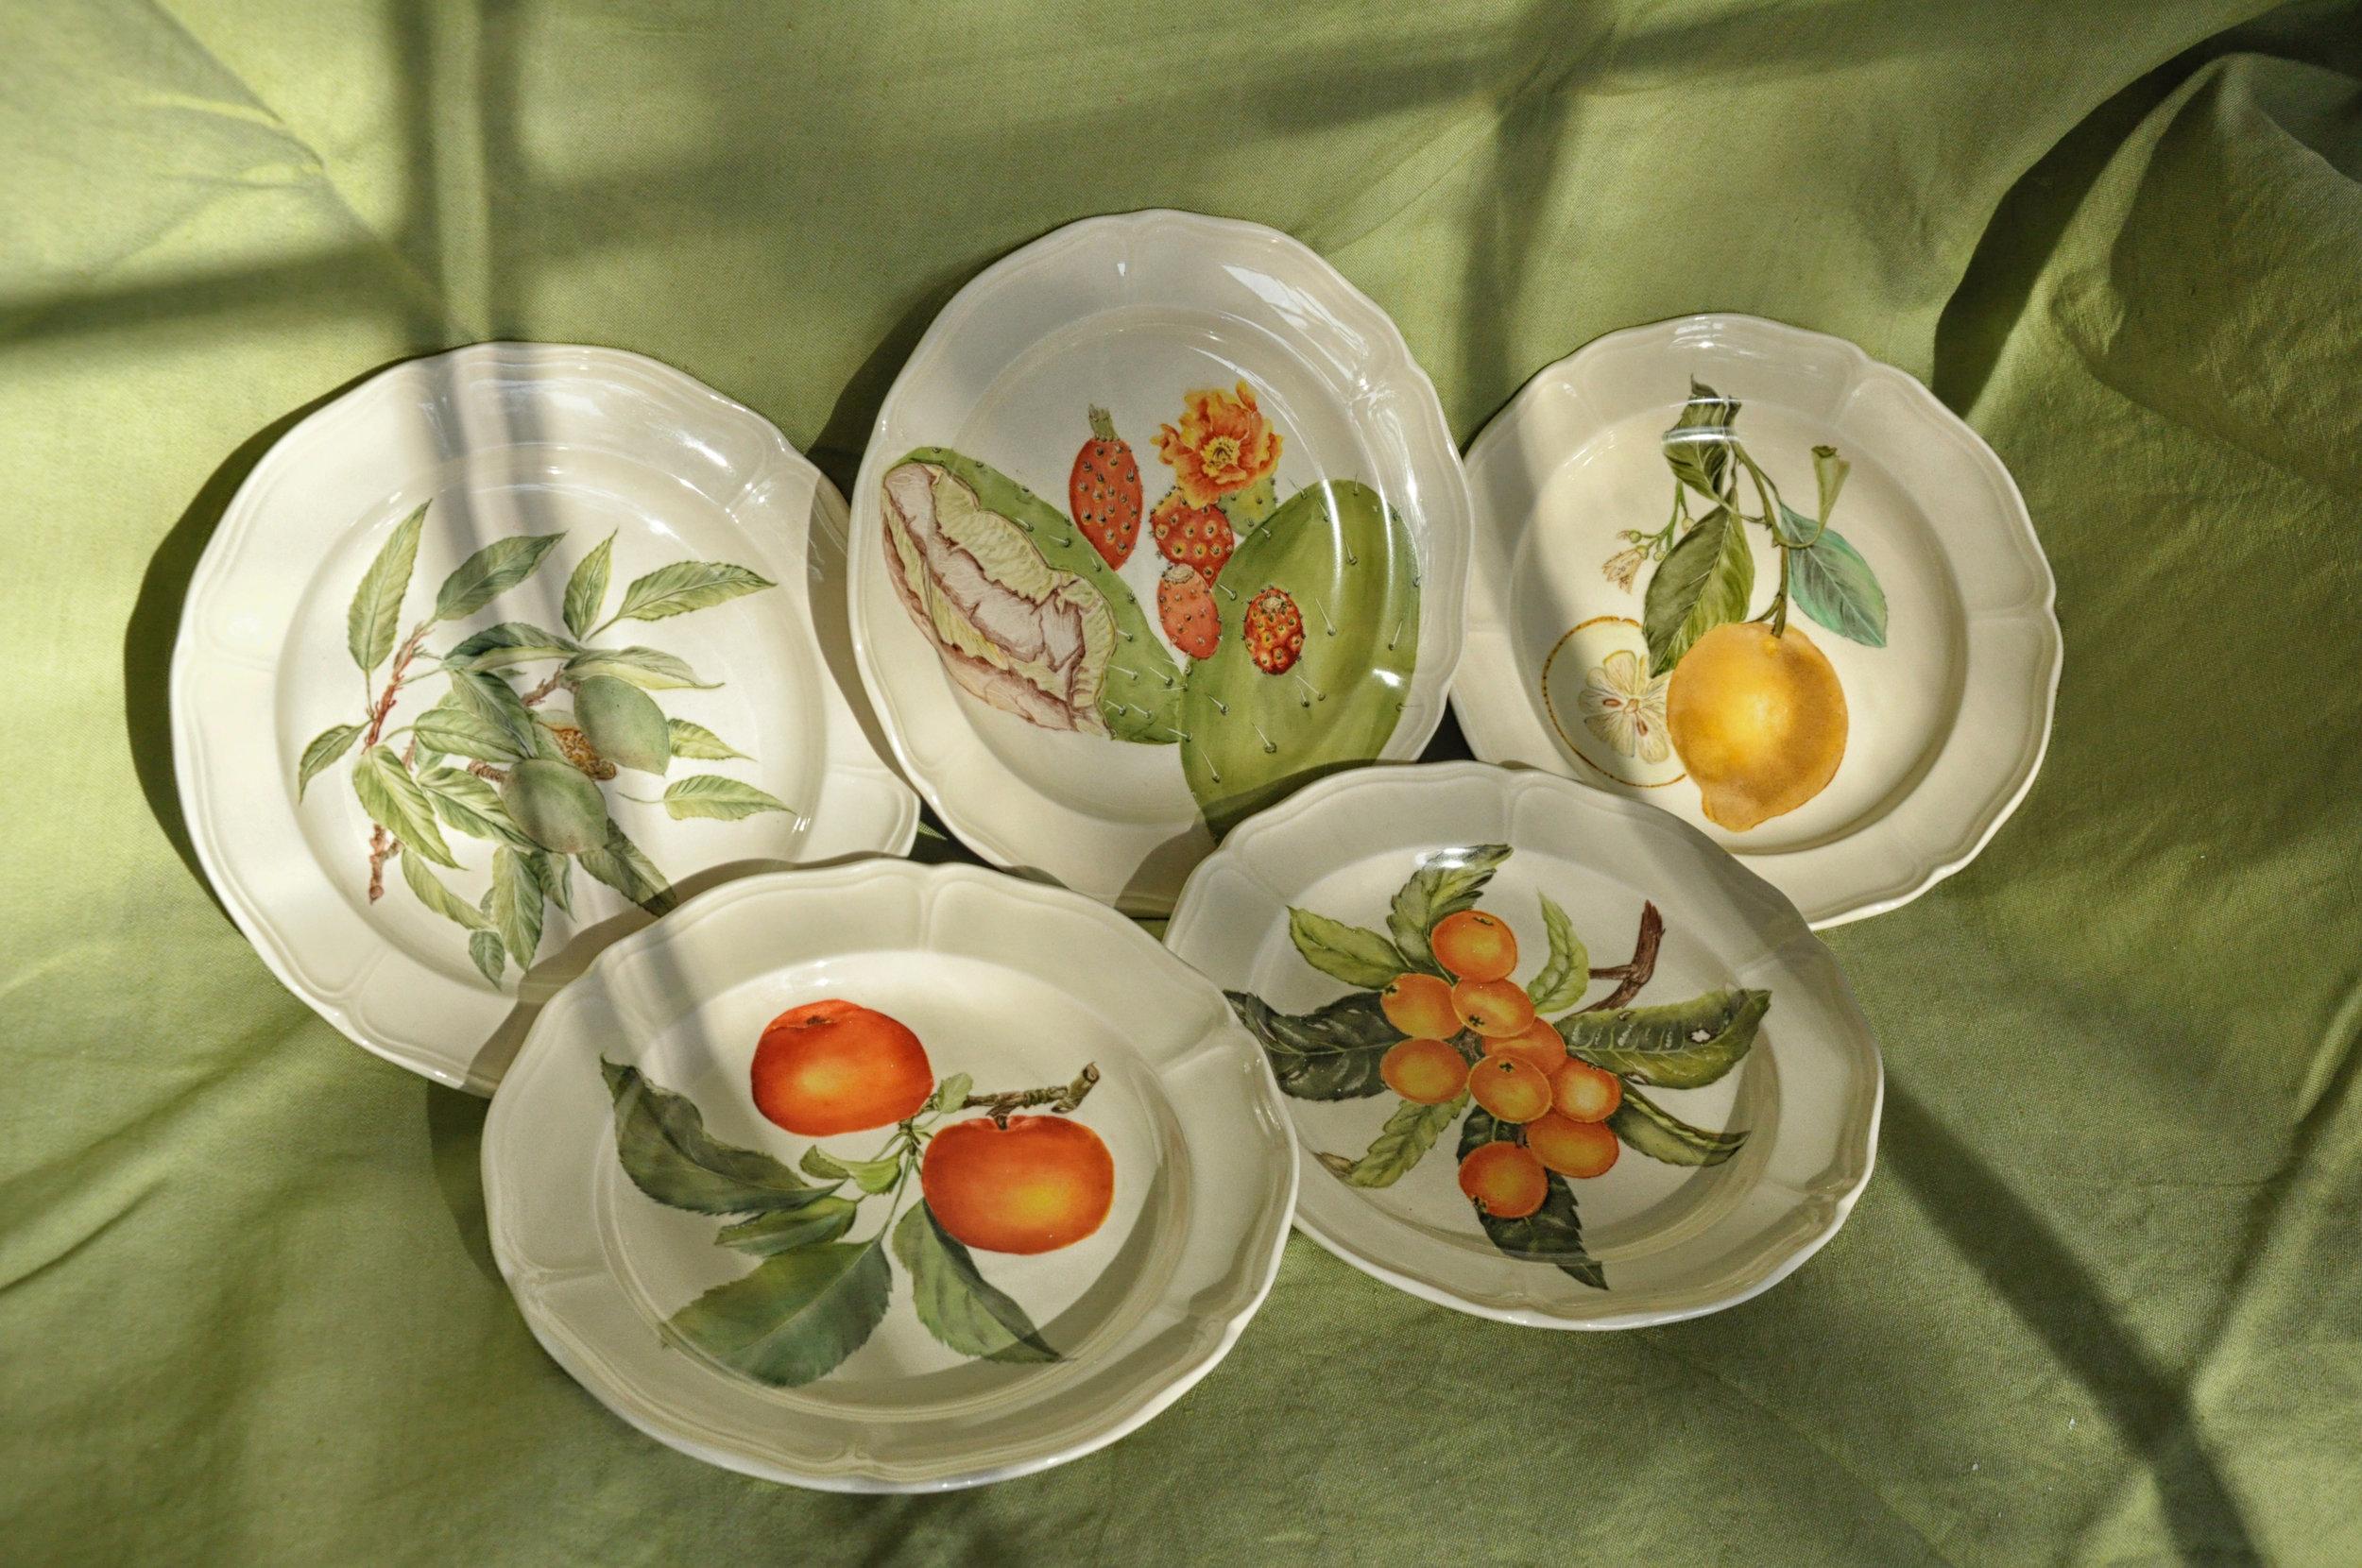 Sud-Est Apulia Salento PugliaArtisans Porcelain